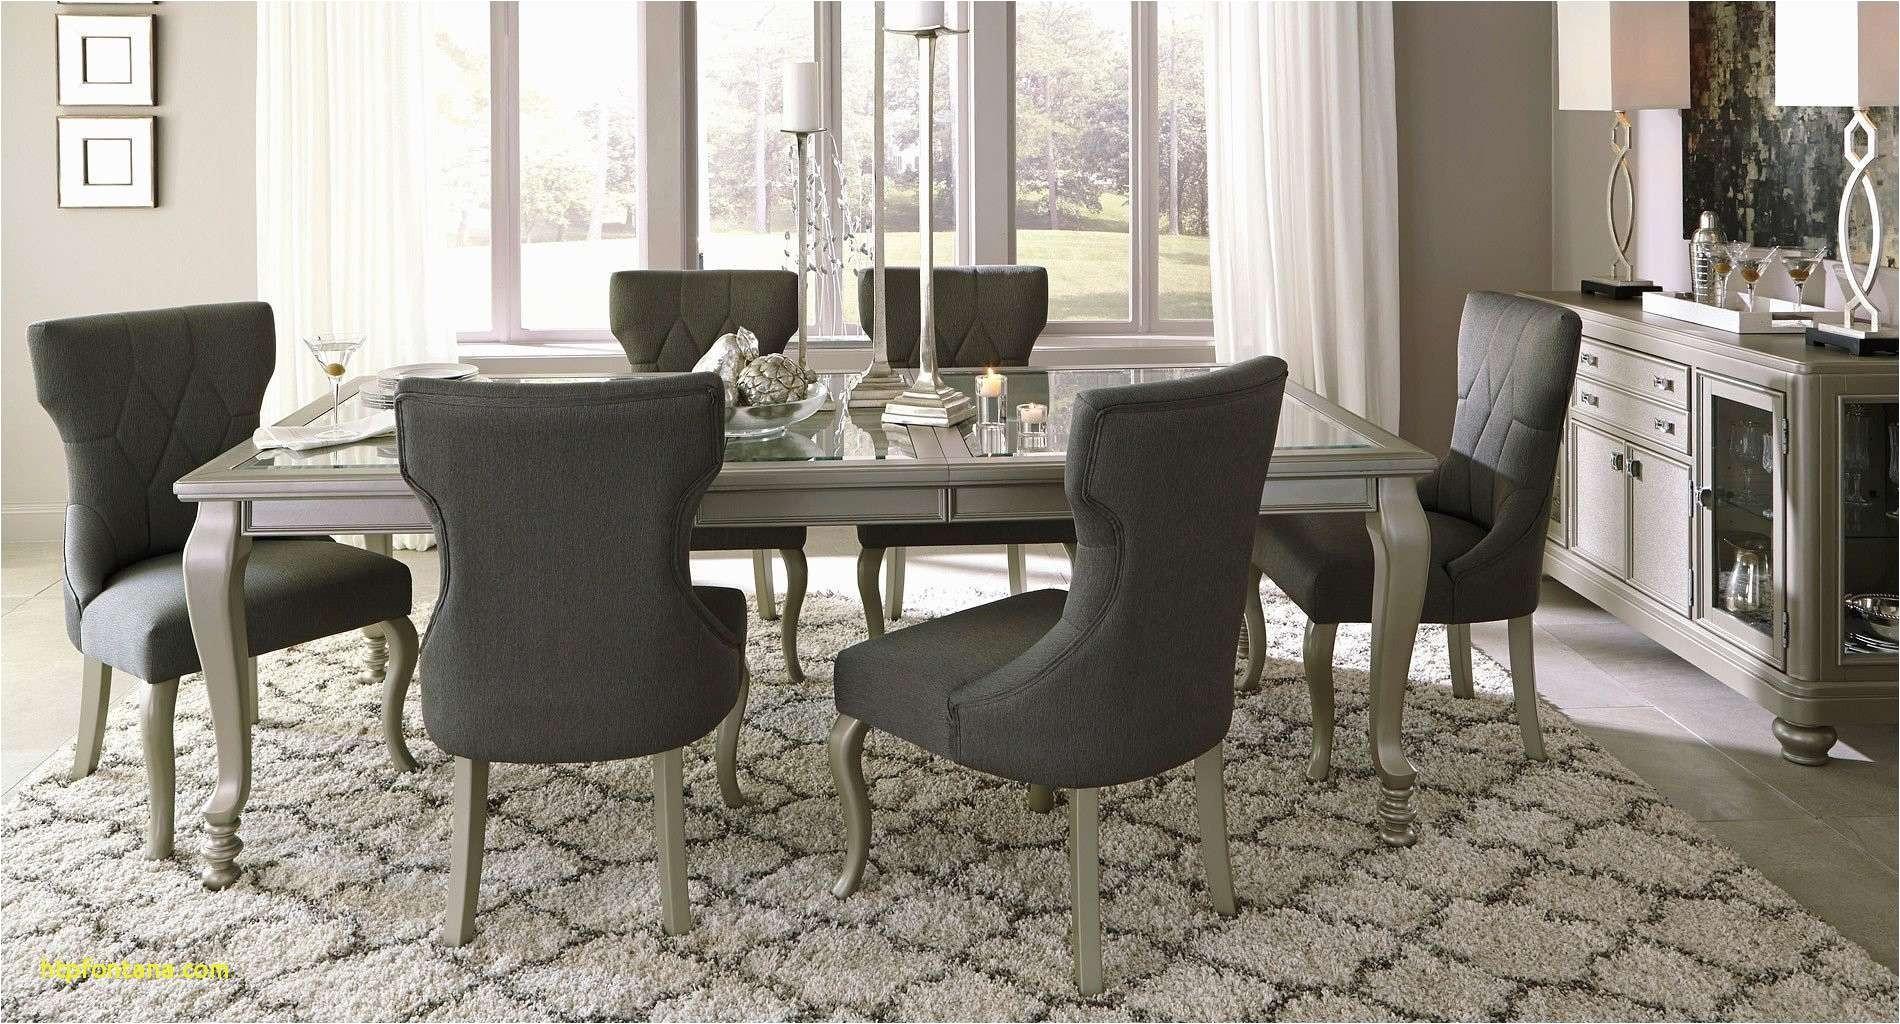 lovely modern living room and kitchen design fresh shaker chairs 0d scheme